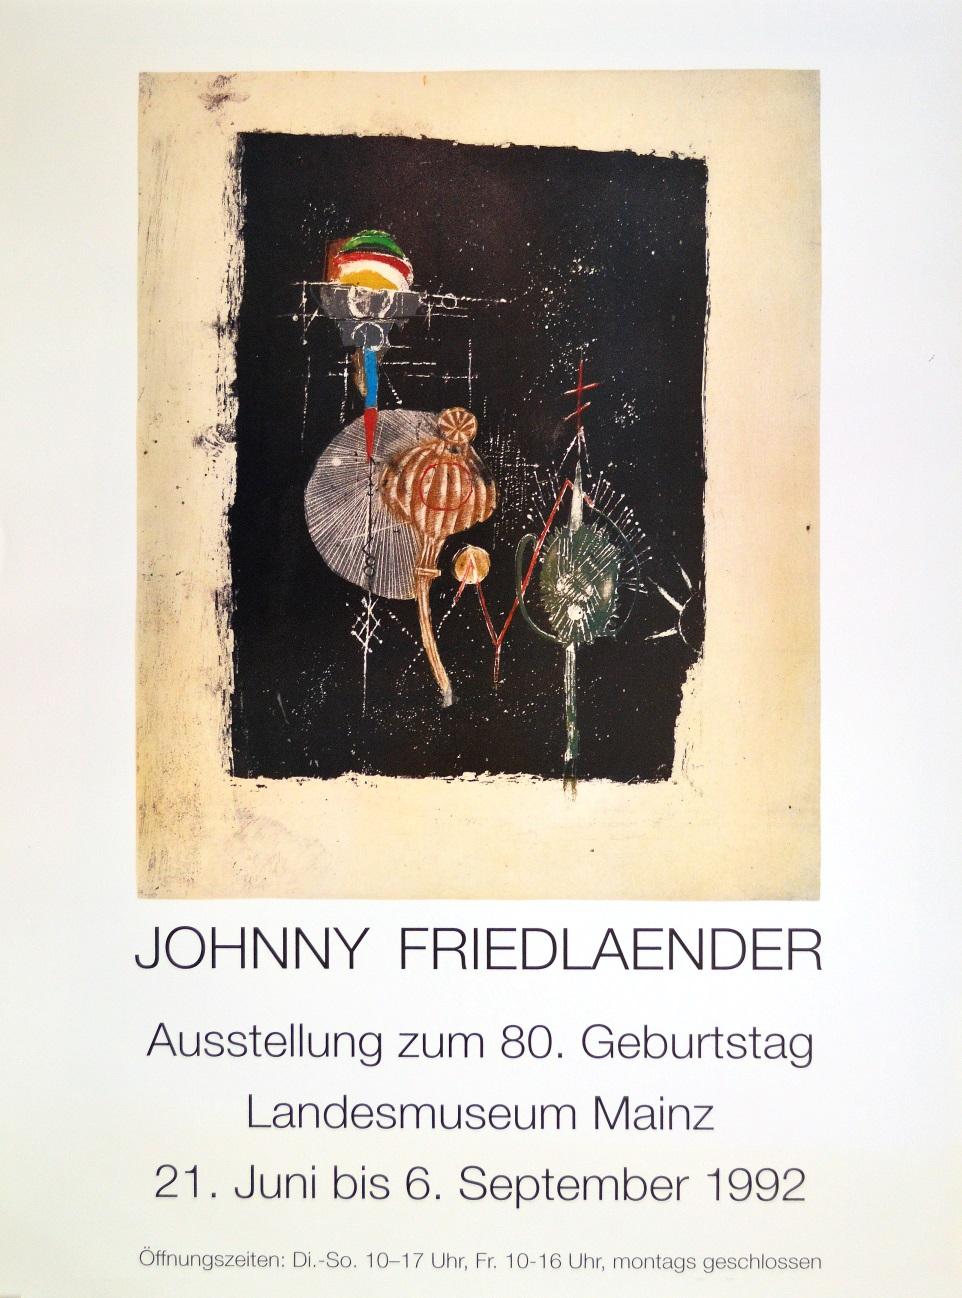 johnny friedlaender landesmuseum mainz poster kunstdruck bild plakat 84 1x59 4cm ebay. Black Bedroom Furniture Sets. Home Design Ideas